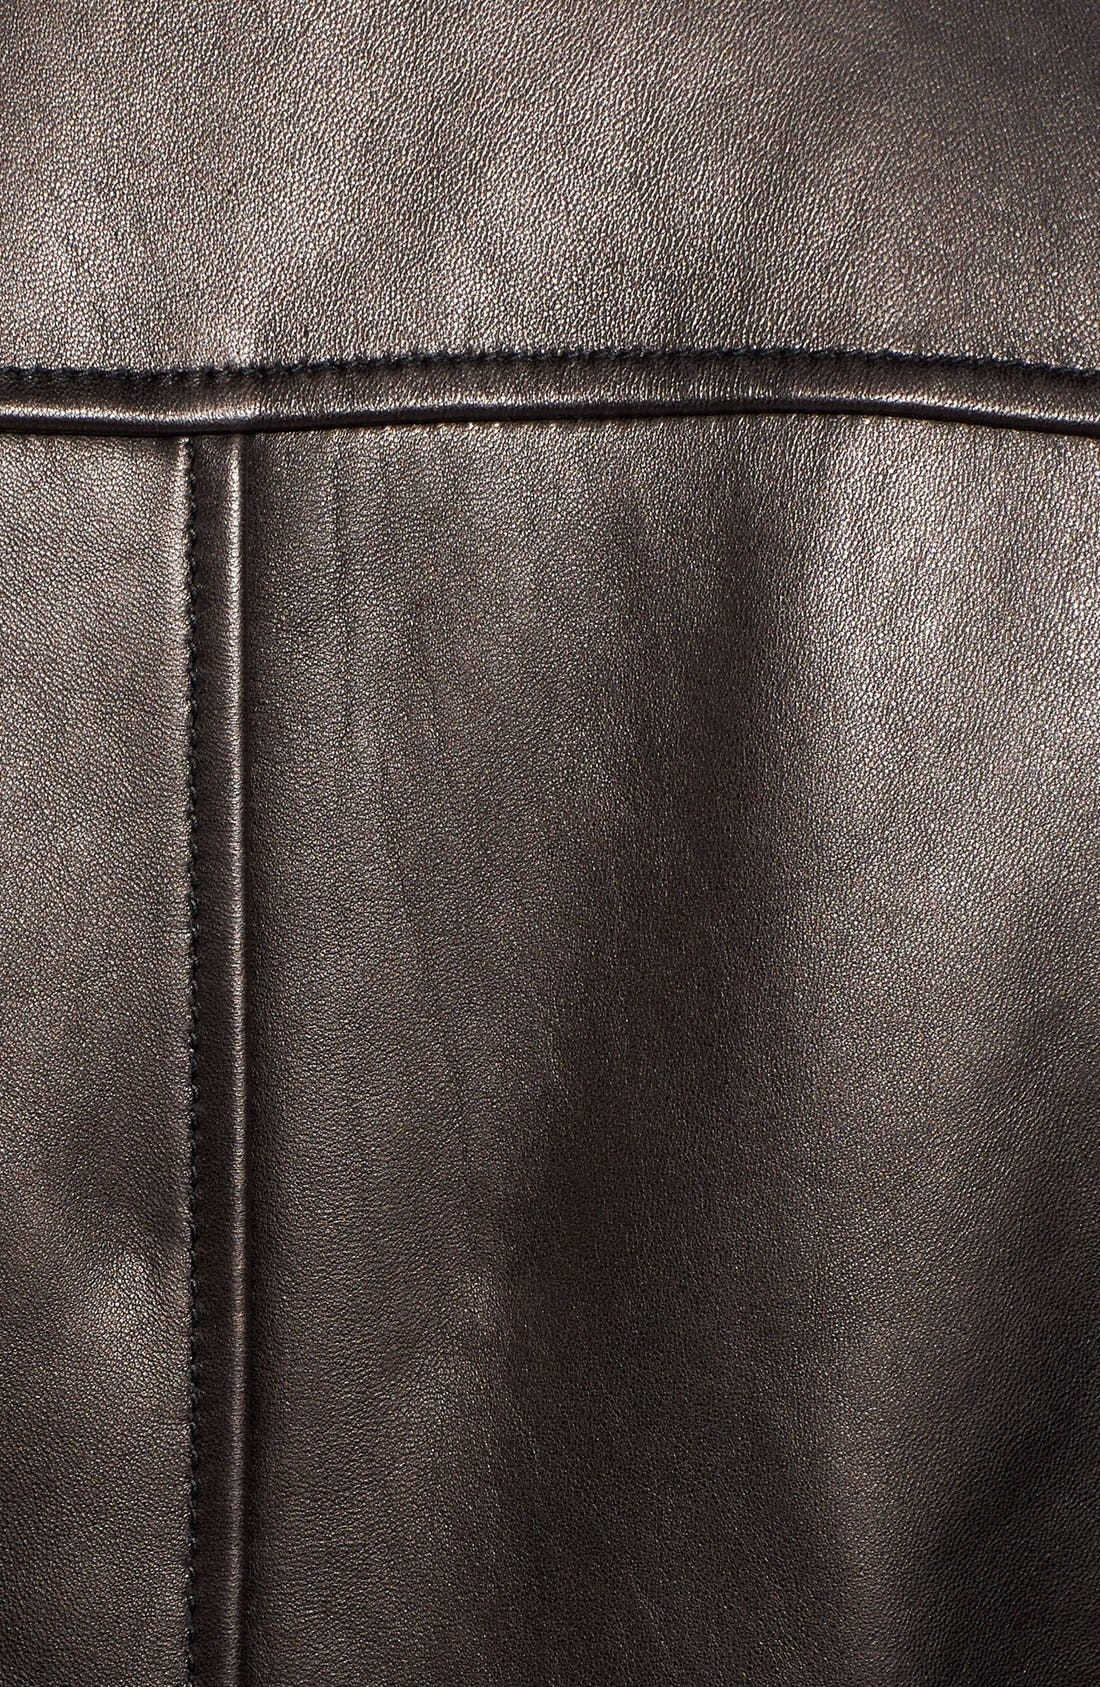 Lambskin Leather Moto Jacket,                             Alternate thumbnail 5, color,                             Black